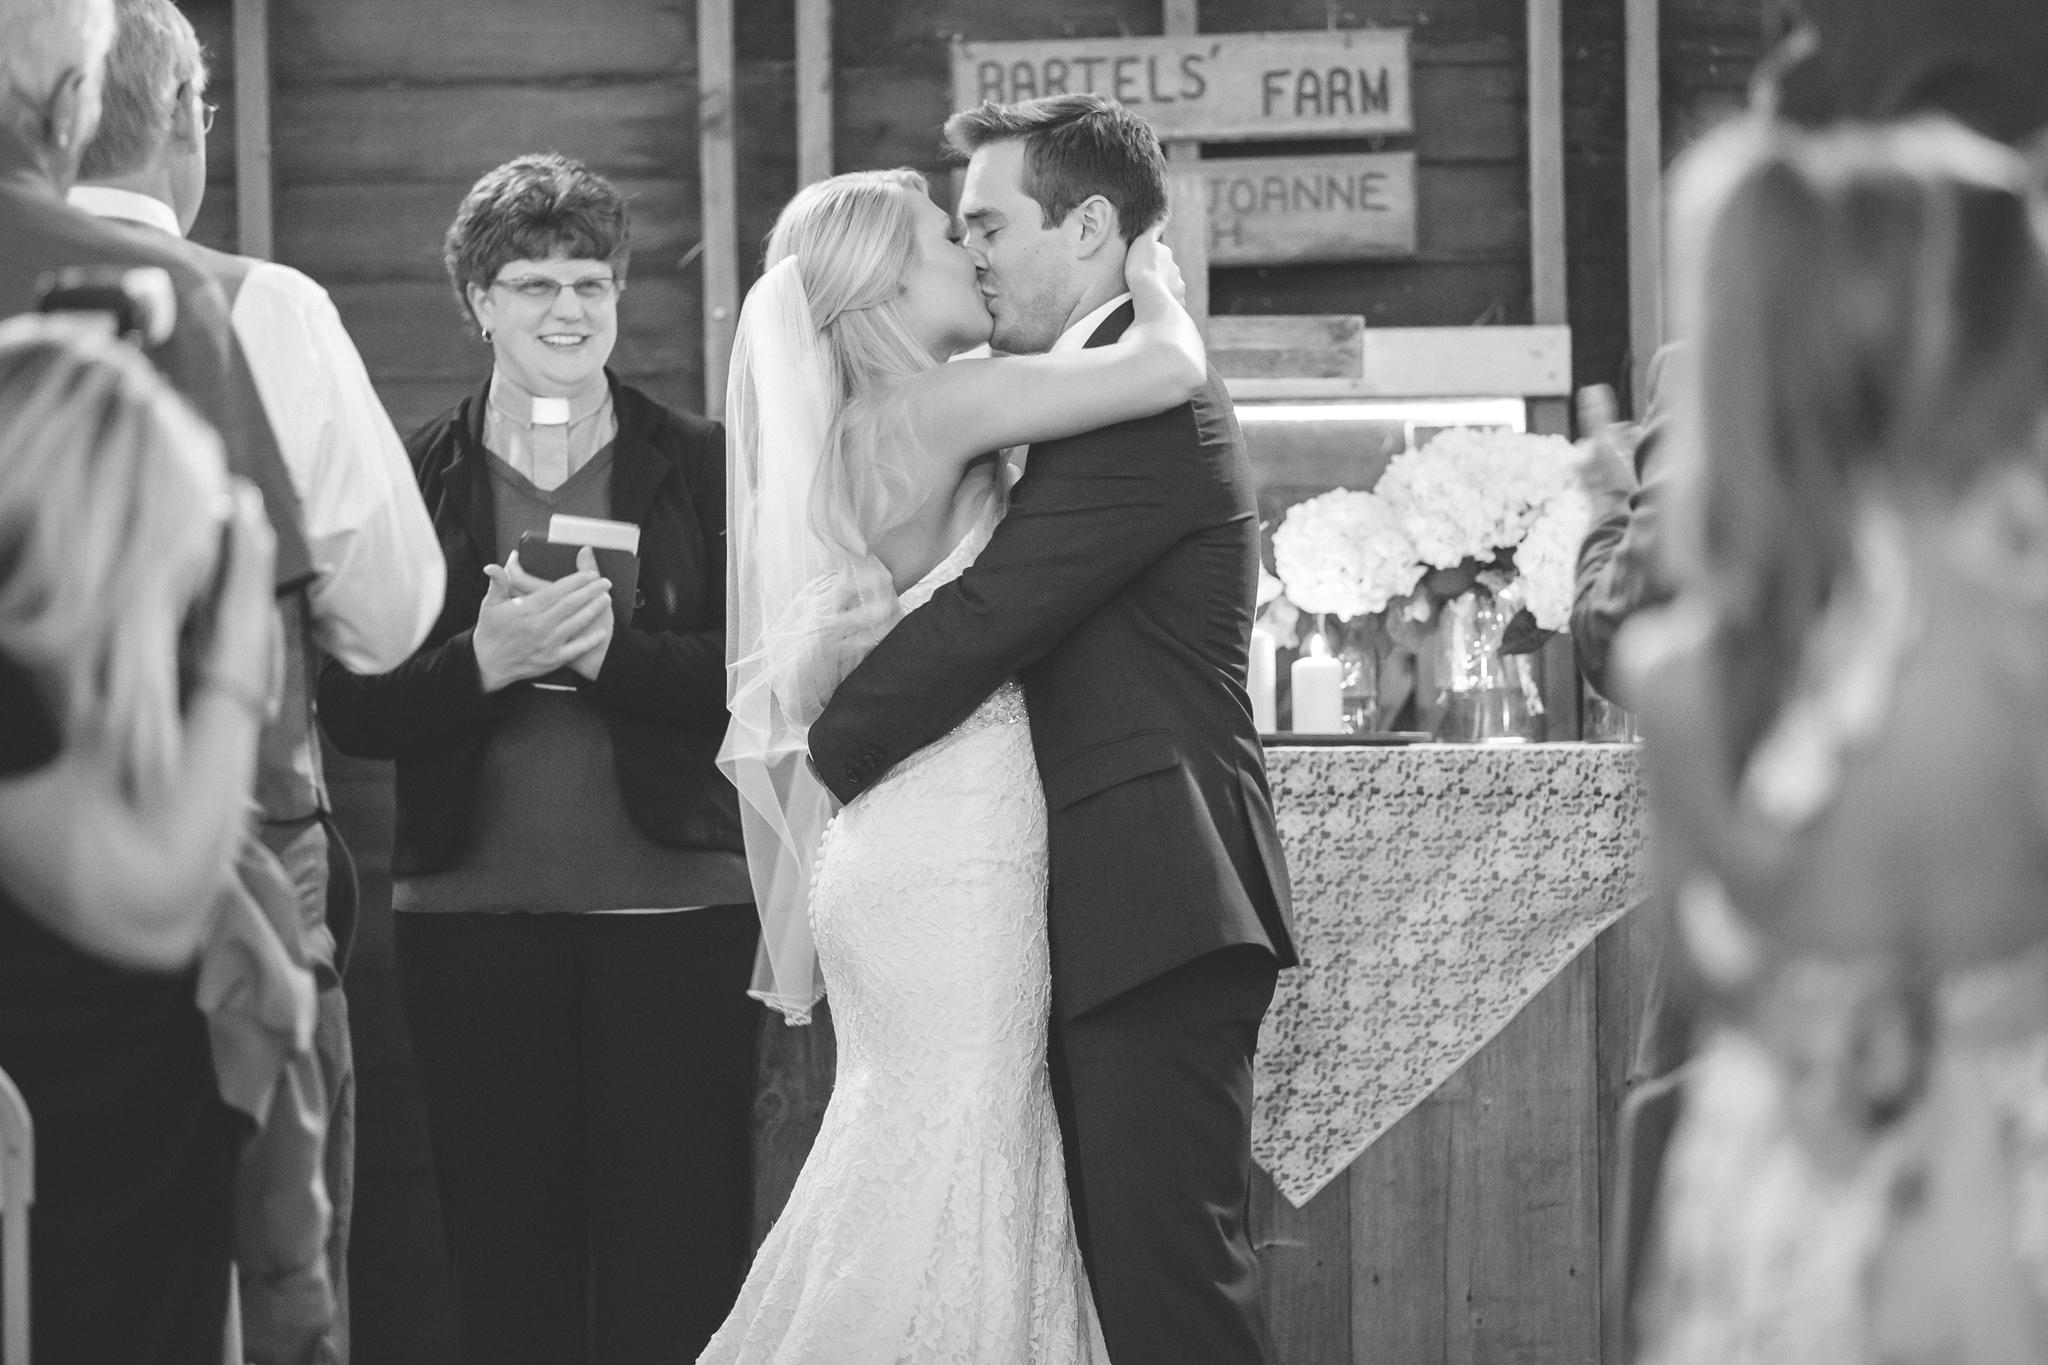 family farm minnesota wedding photography-8.jpg